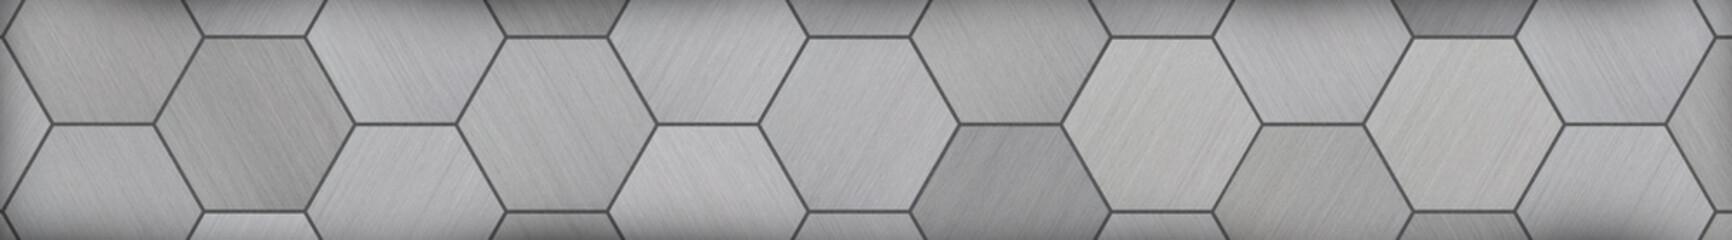 Hexagonal Aluminum Panoramic Metal Background (Letterbox Format)